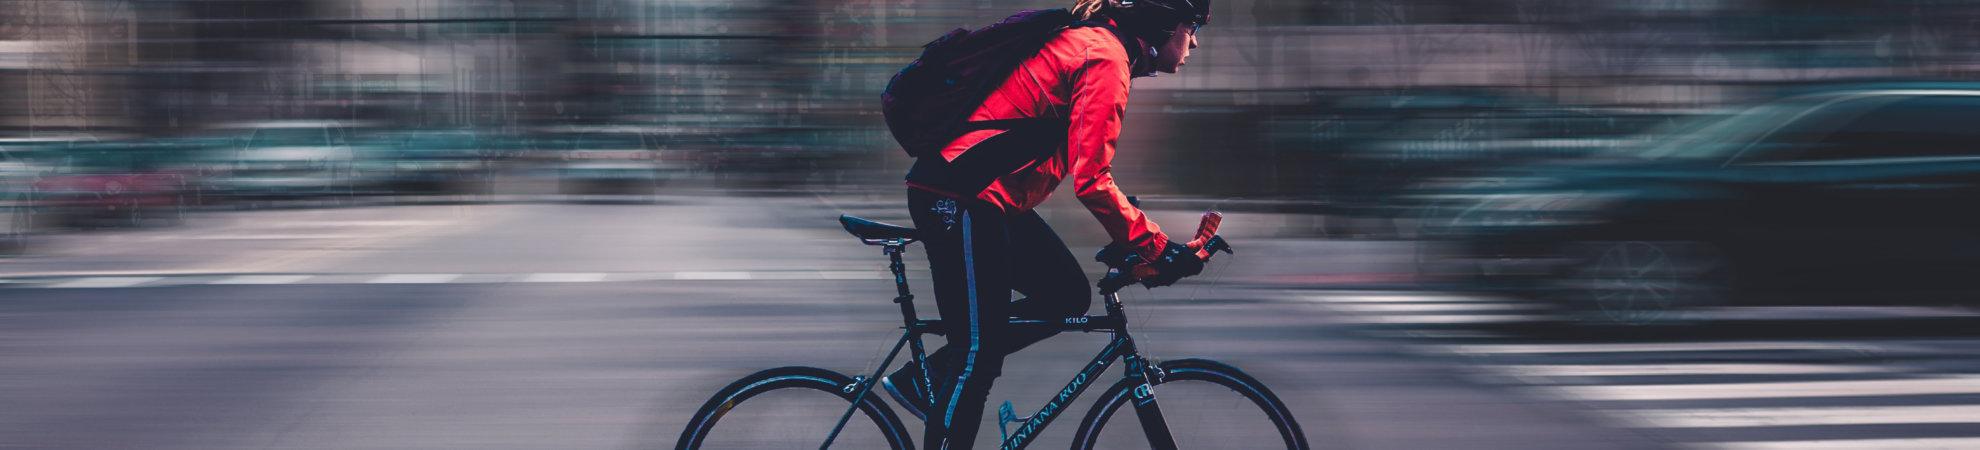 City Cyclists